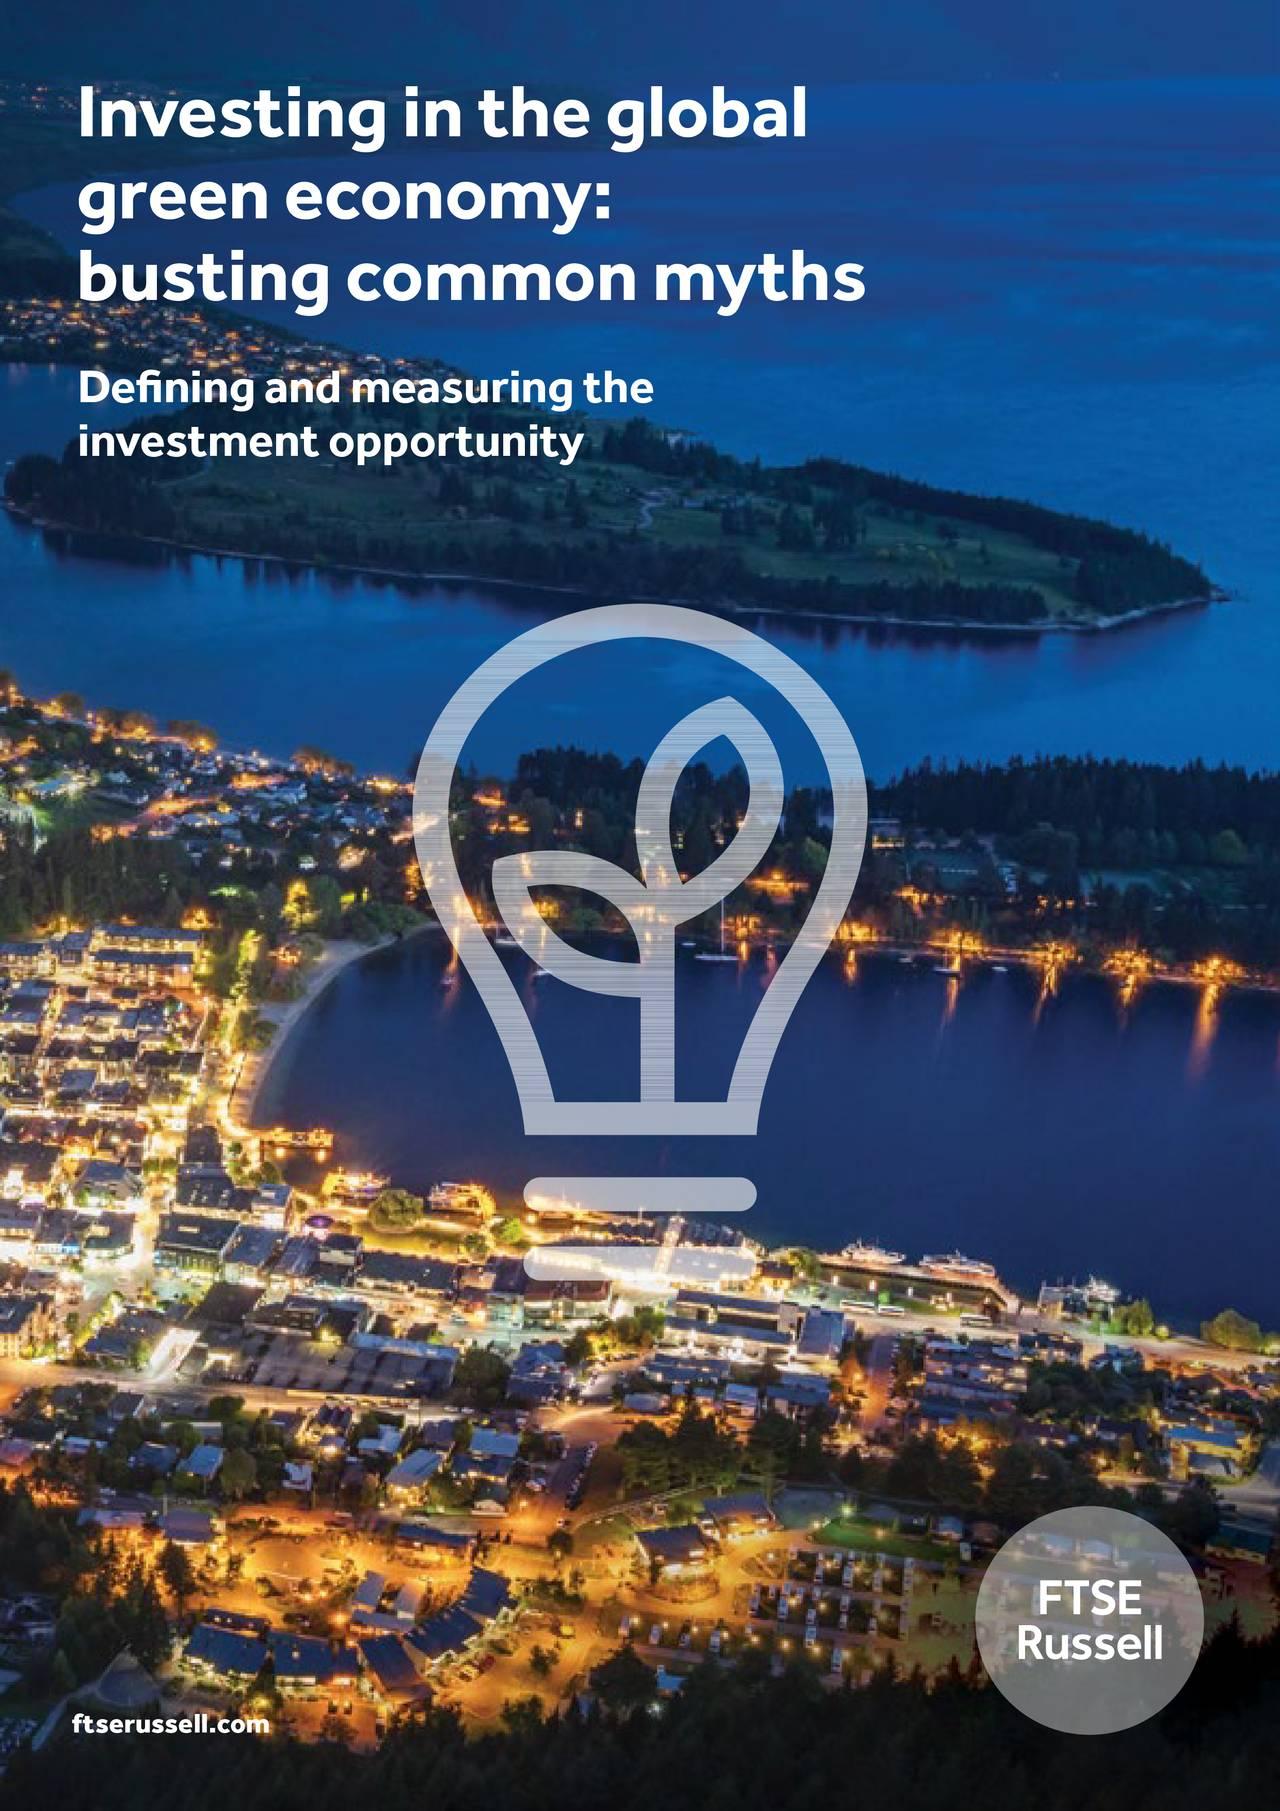 greeneconomy: bustingcommonmyths Definingandmeasuringthe investmentopportunity ftserussell.com